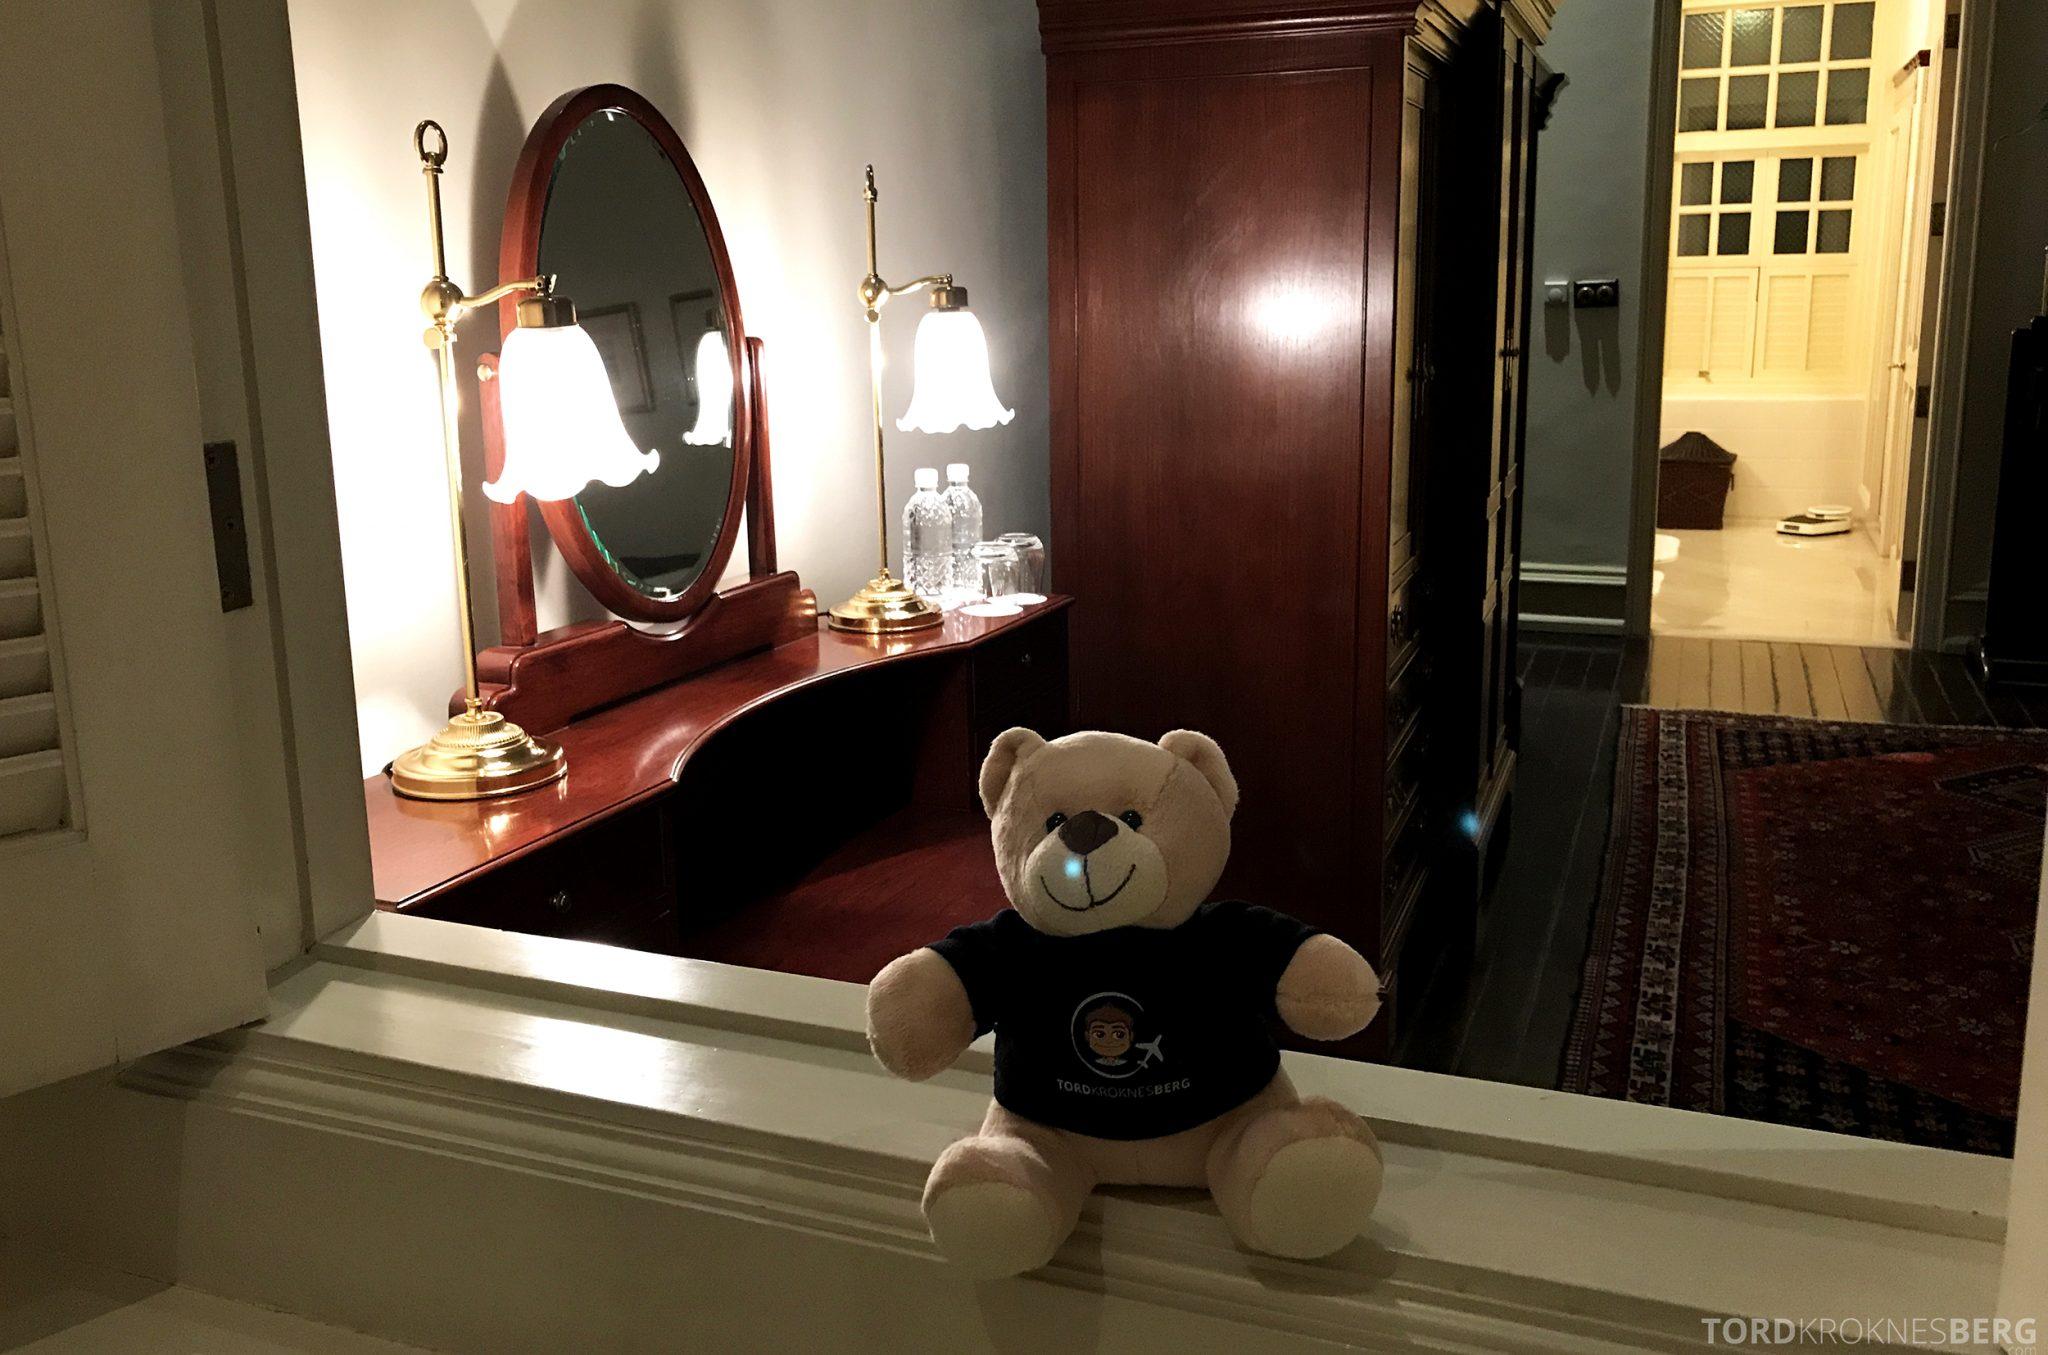 Raffles Hotel Singapore reisefølget i suitem